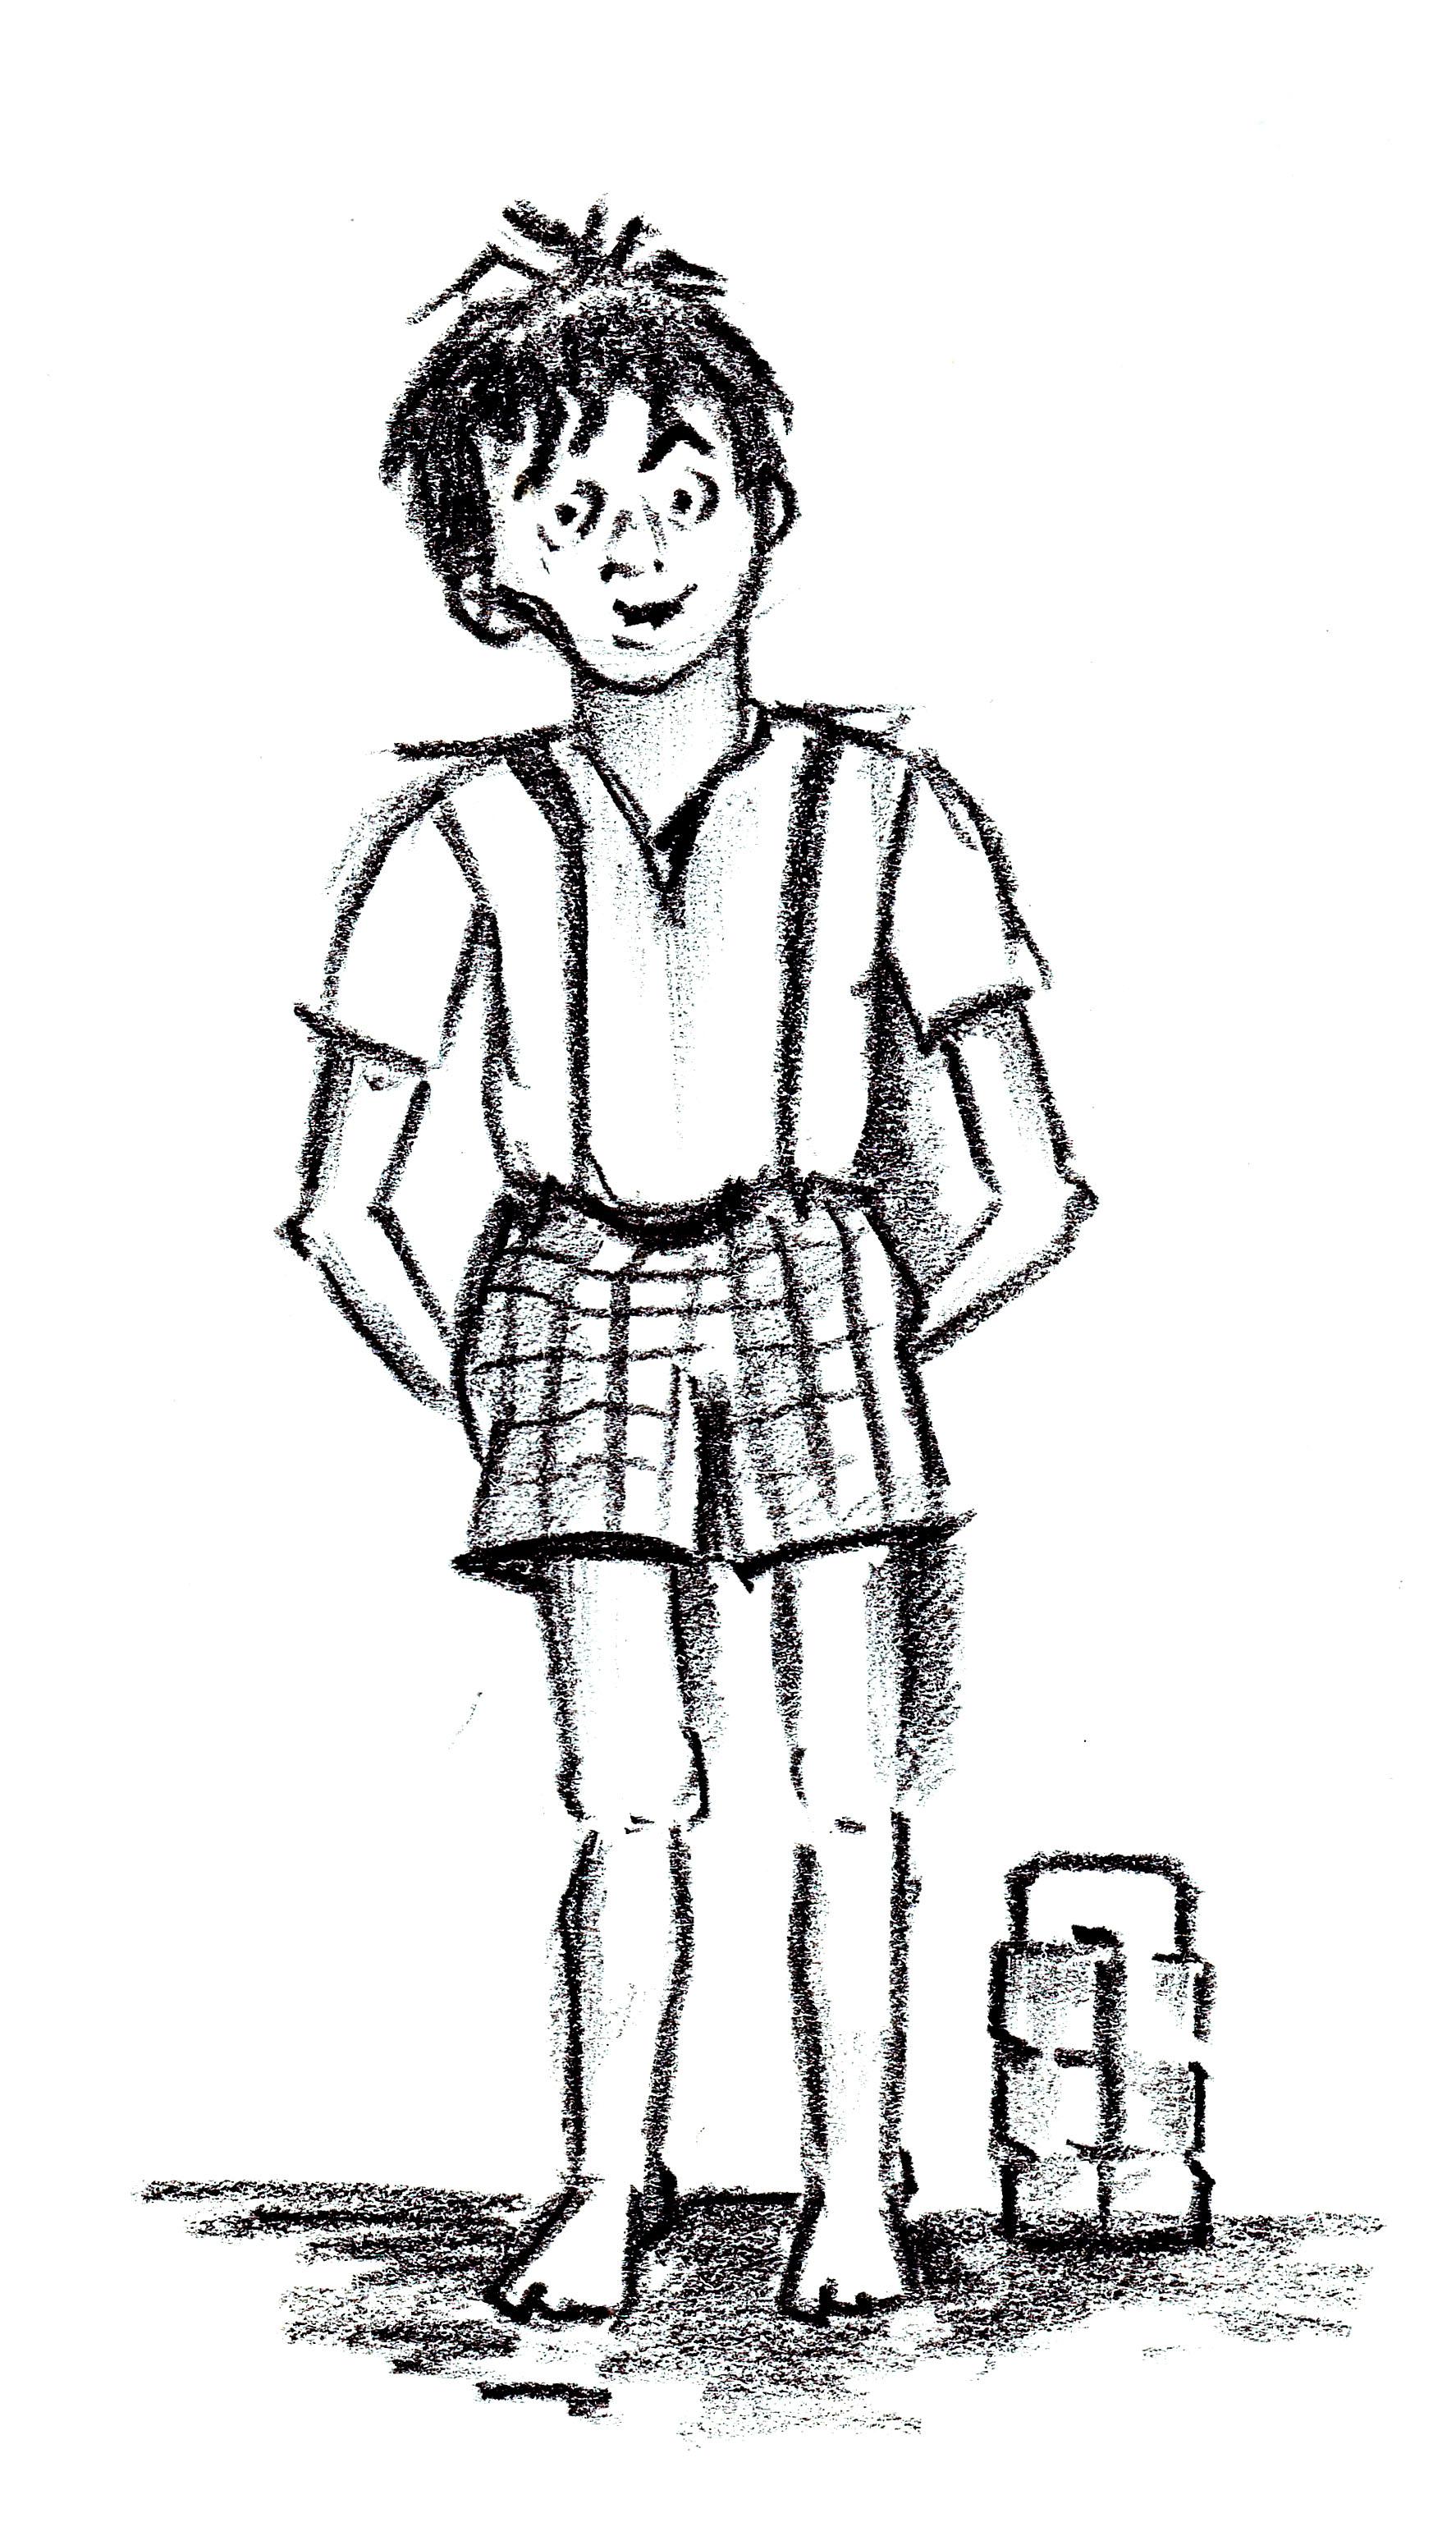 1774x3089 Child Labour Drawing Child Labour Sketches Image Child Labour